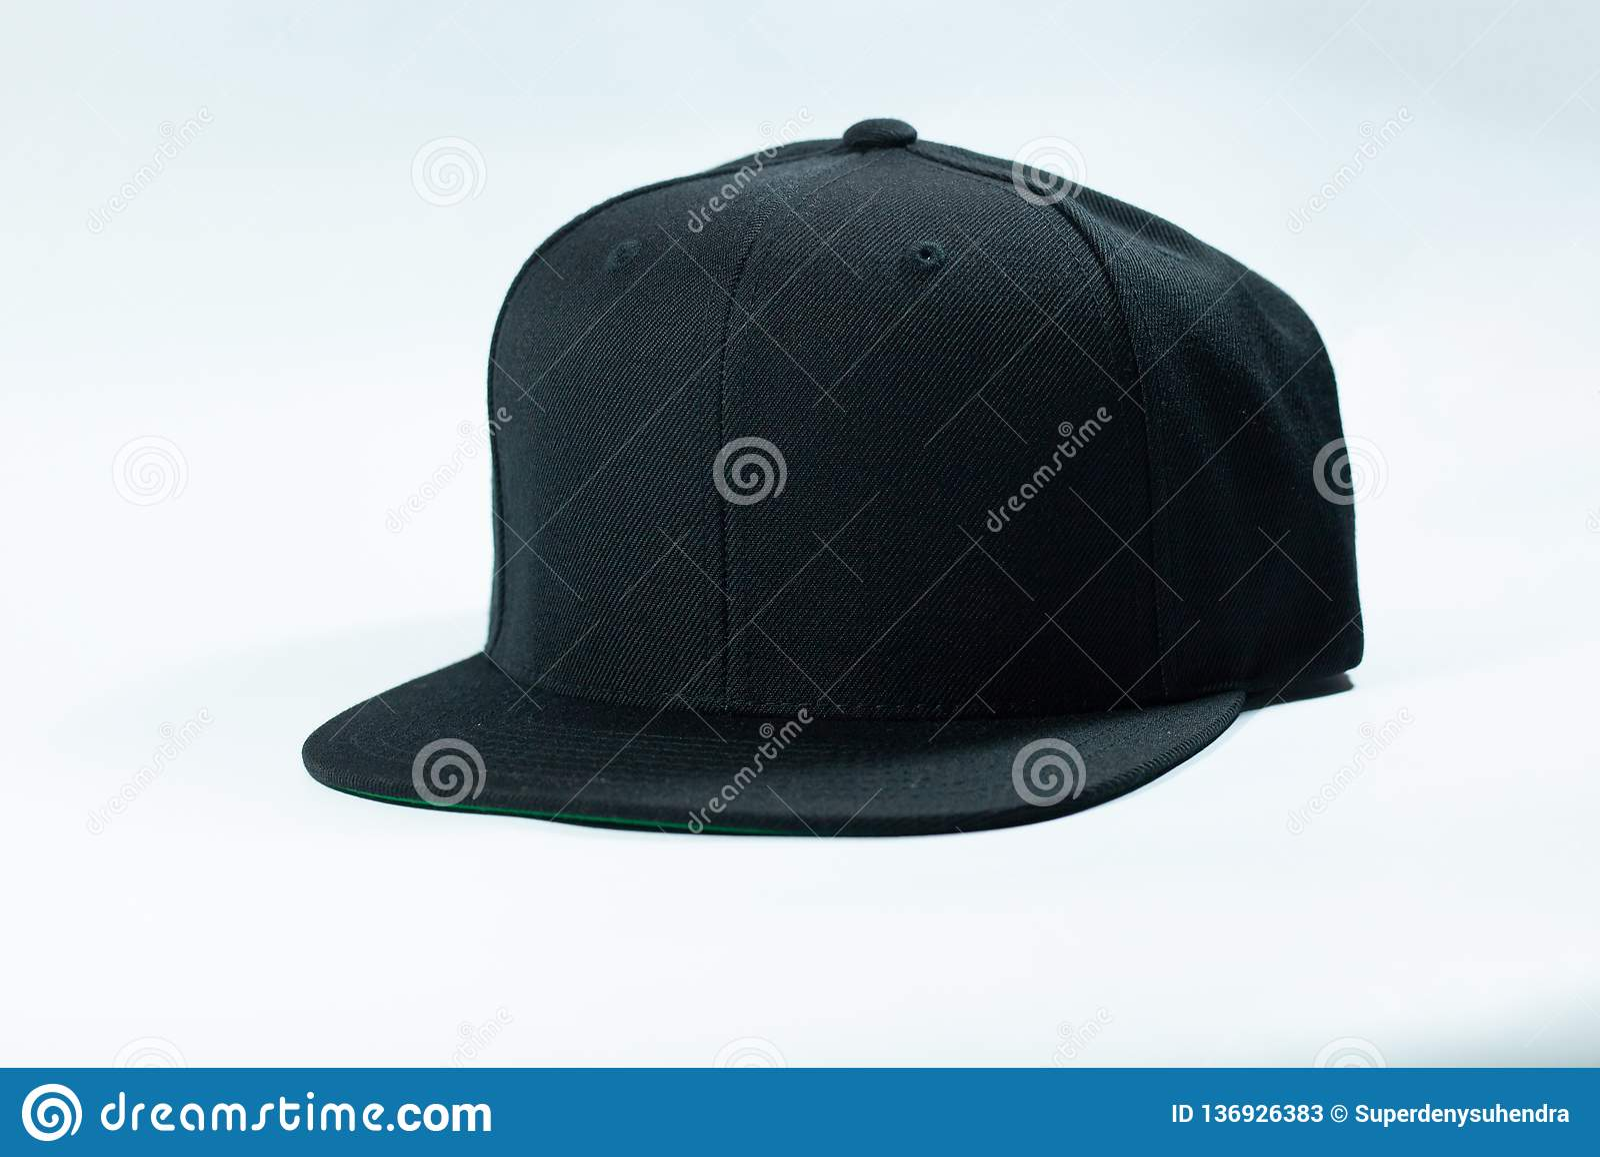 9f8e2087229 98+ Blank Adjustable Flat Bill Plain Snapback Hats Caps All Colors ...